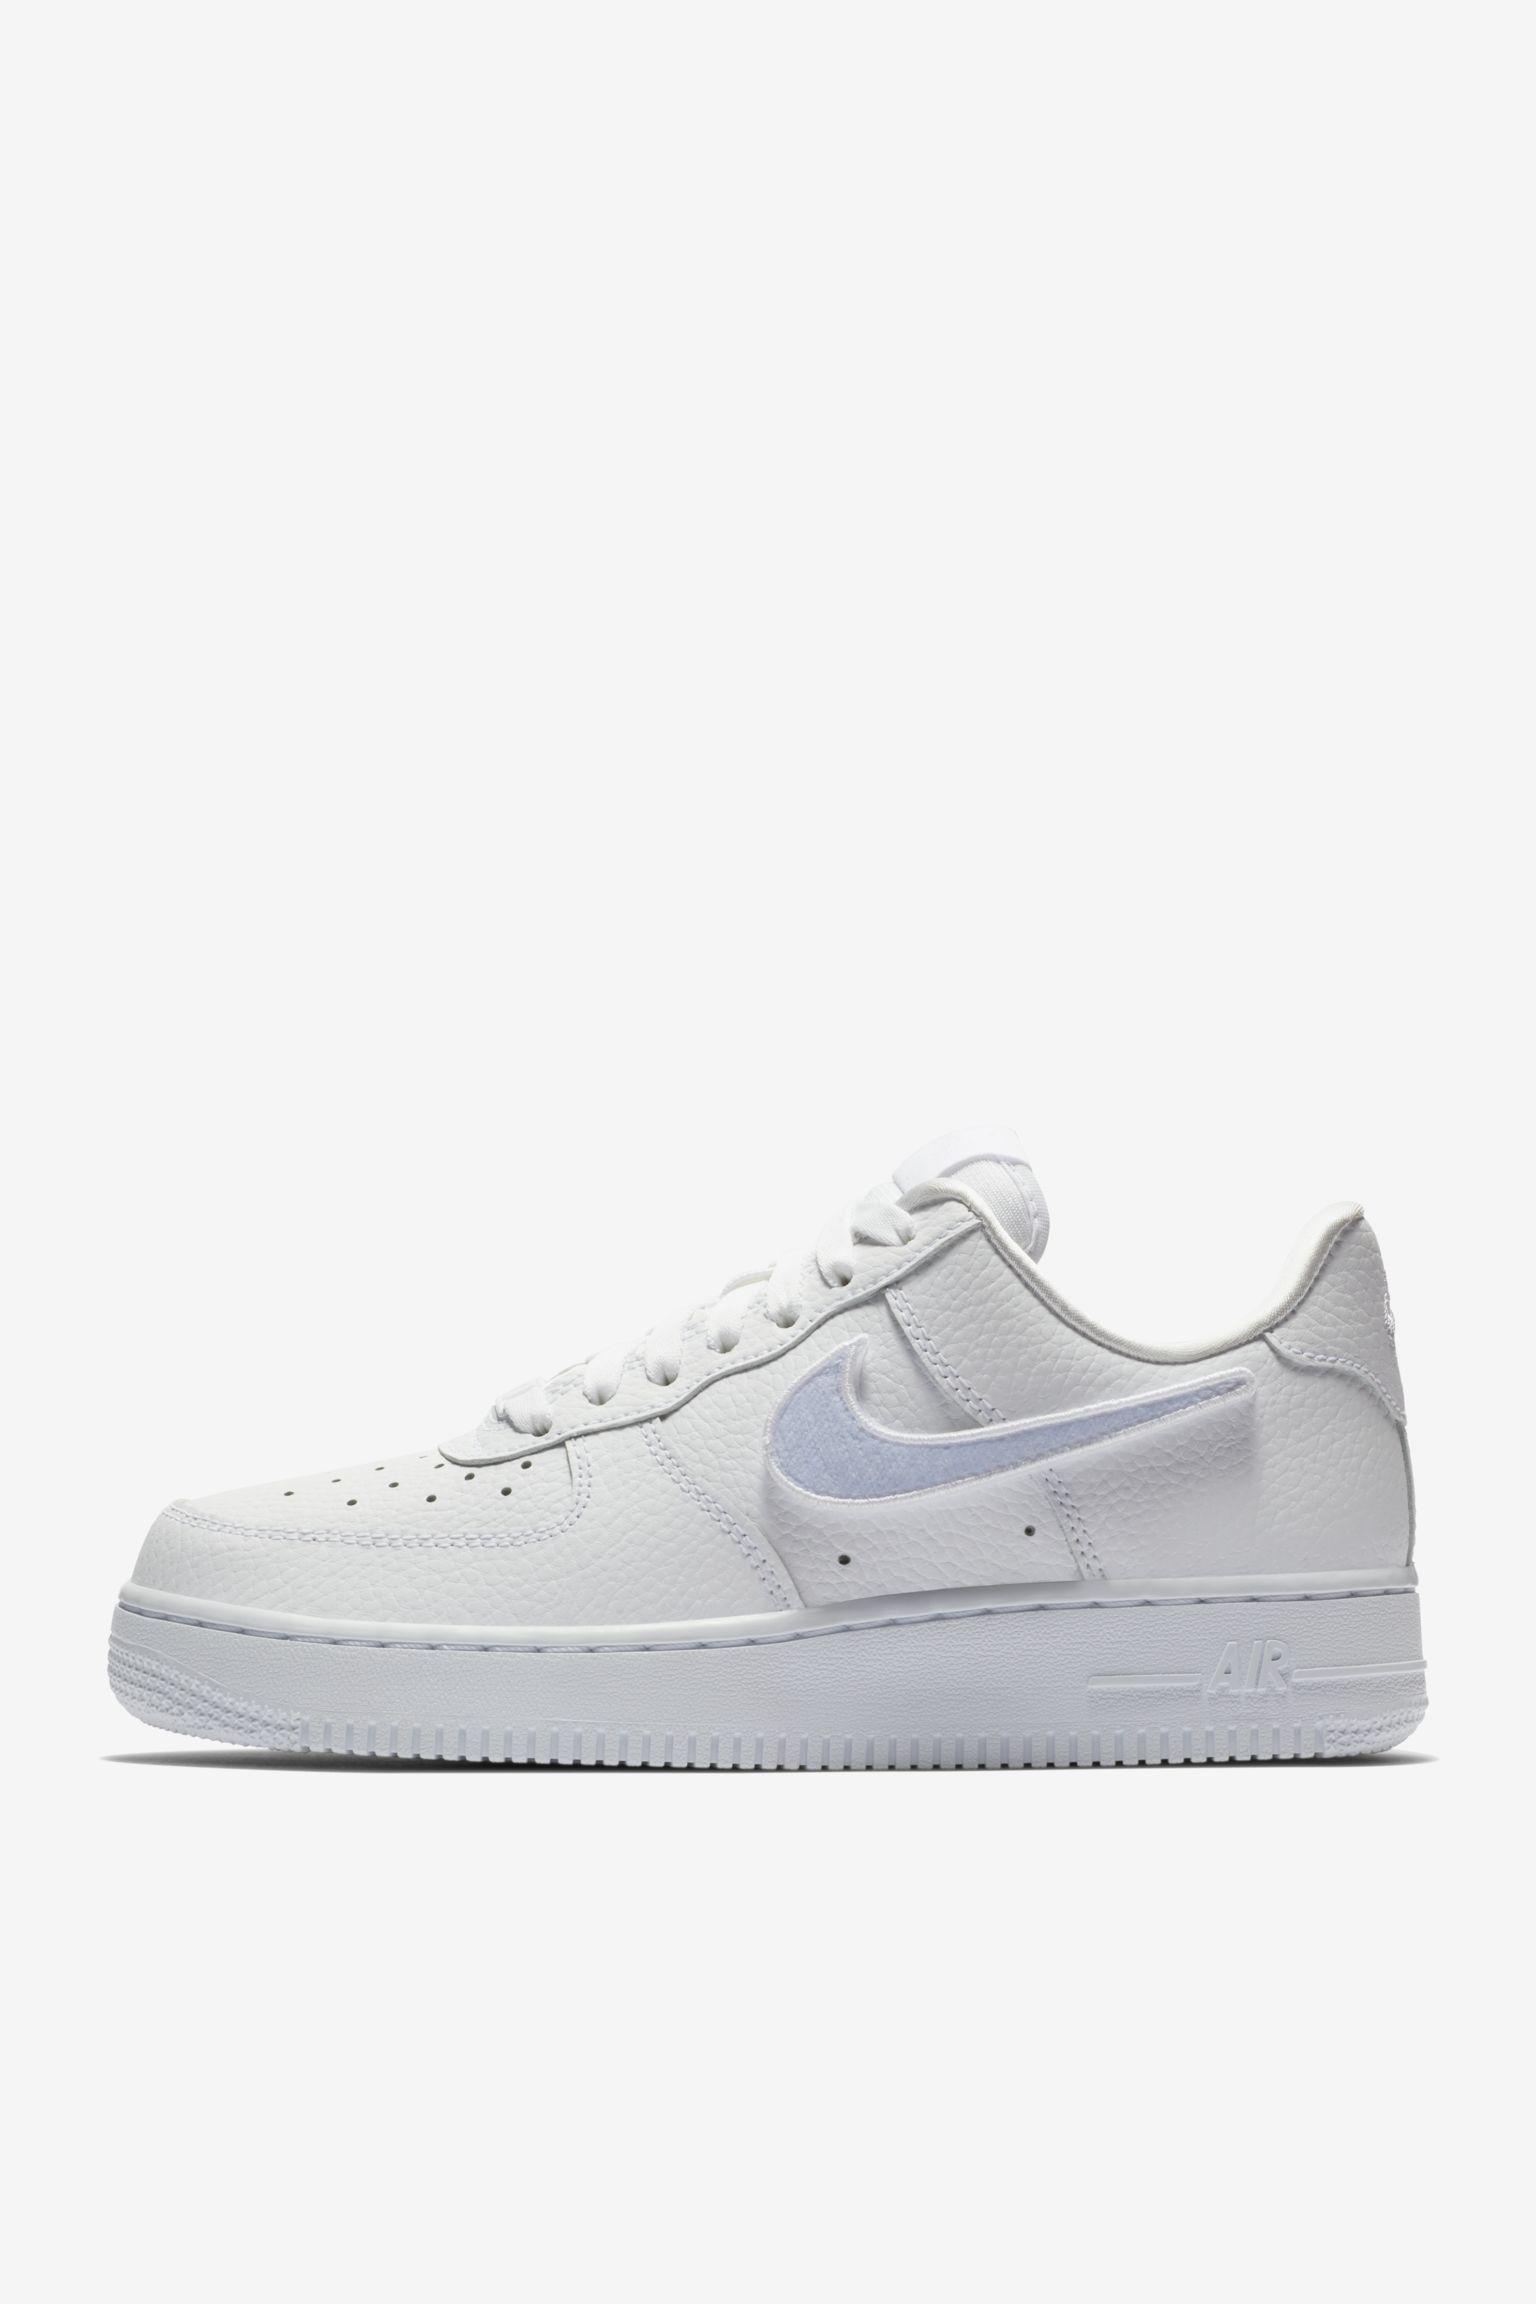 38af90e88a99f4 Nike Women s Air Force 1-100  Triple White  Release Date. Nike+ ...